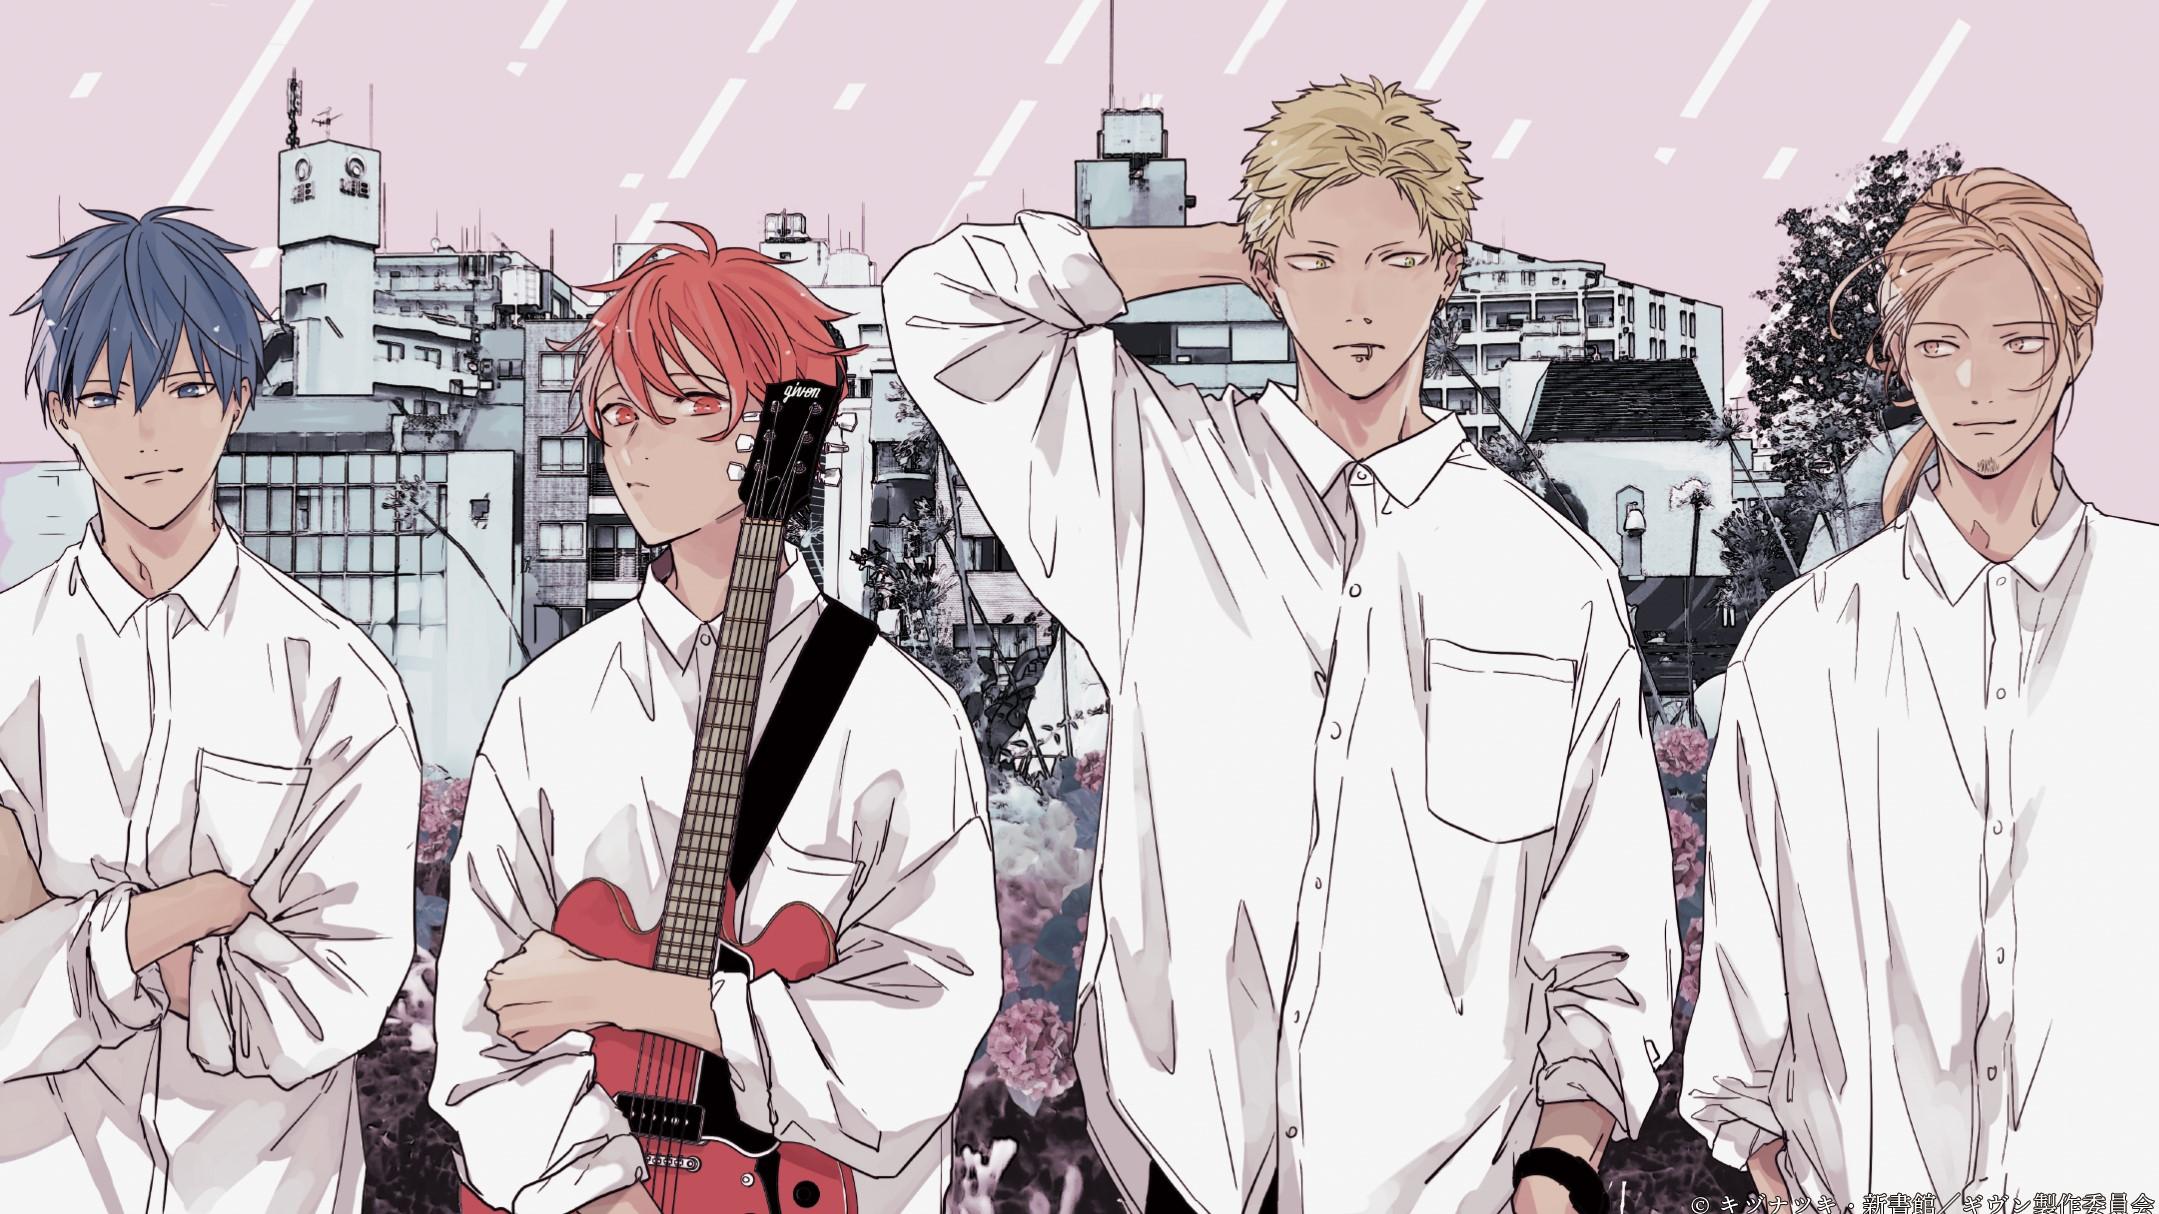 Anime 2159x1214 given Mafuyu Satou Uenoyama Ritsuka Nakayama Haruki Kaji Akihiko anime guitar